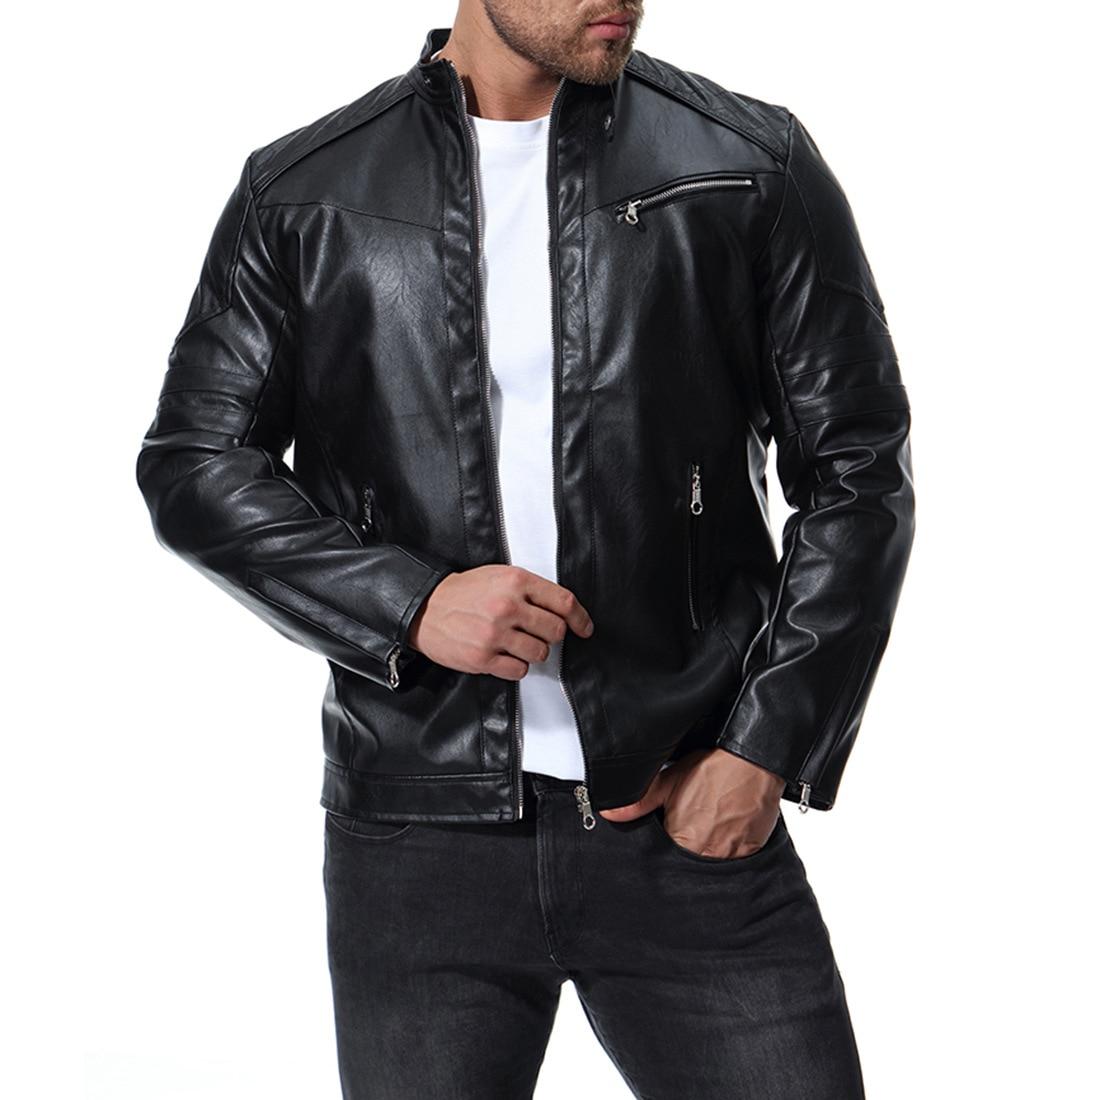 leather jacket men 2018 autumn zipper mens leather jacket slim fit banded mens motorcycle jacket мужские кожанные куртки с косой молнией